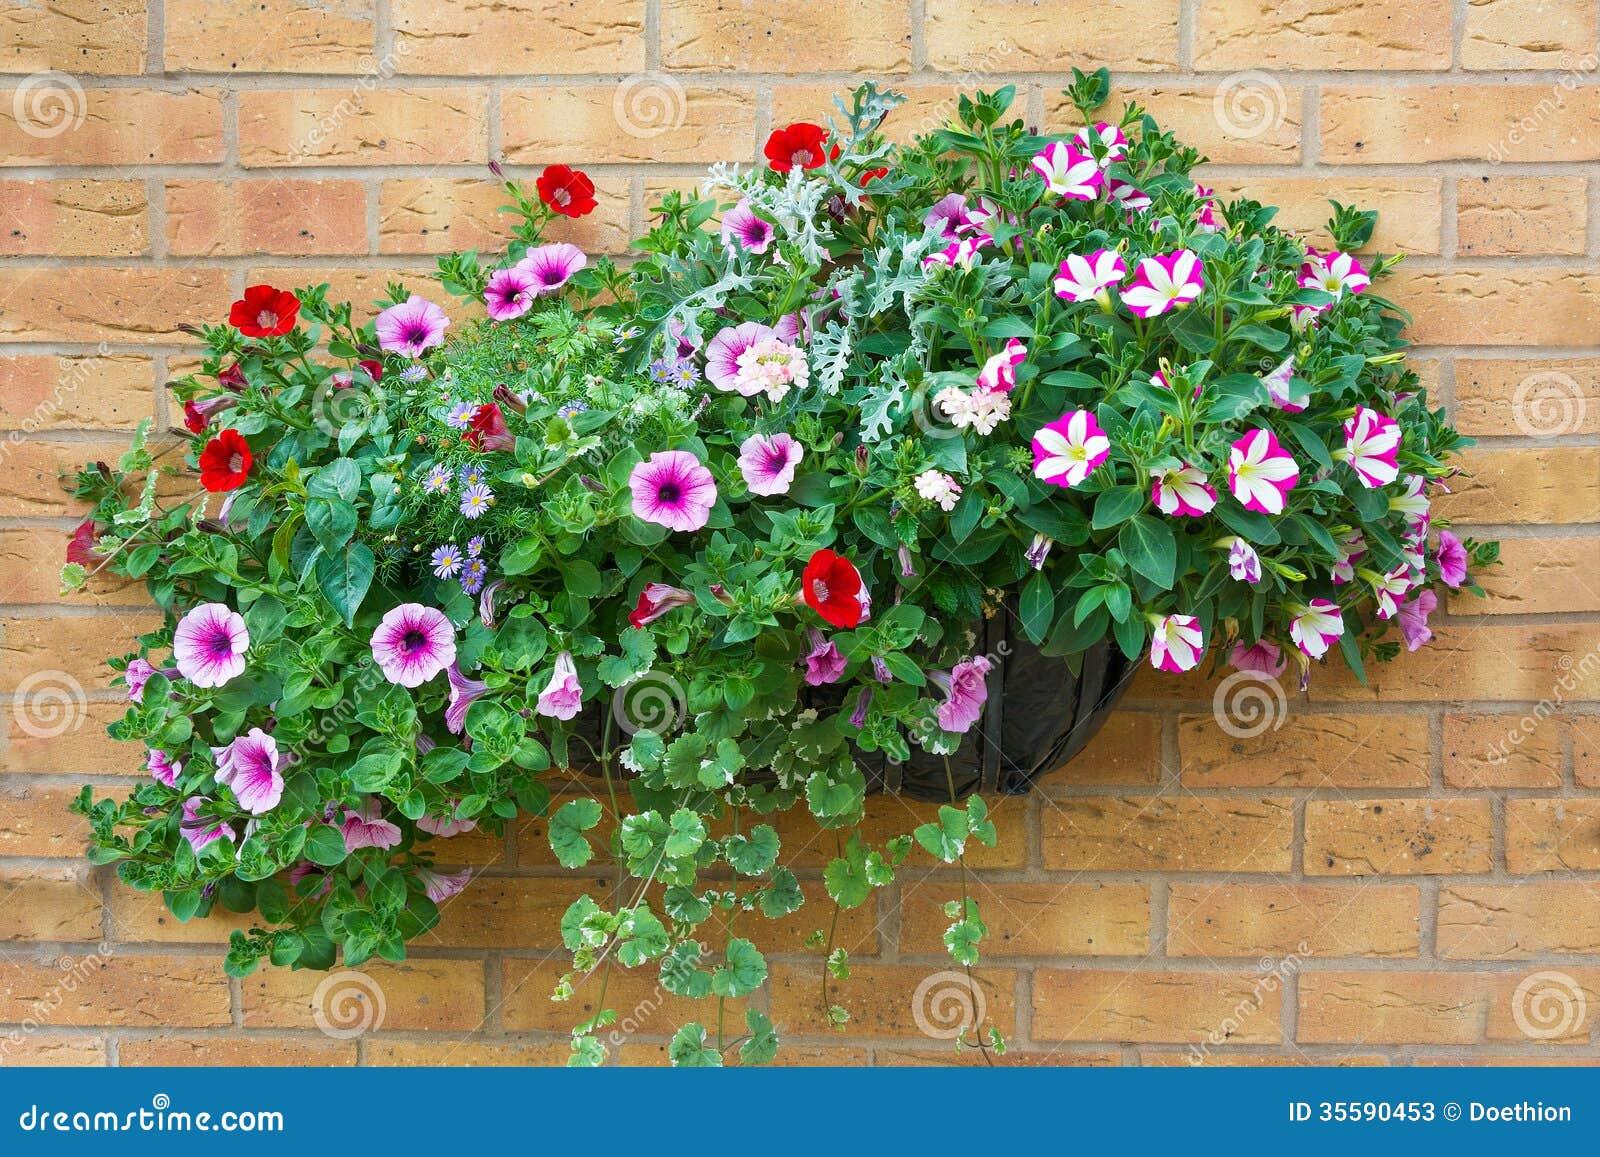 Wall Mount Flower Basket : Summer bedding flowers in a wall mounted basket stock